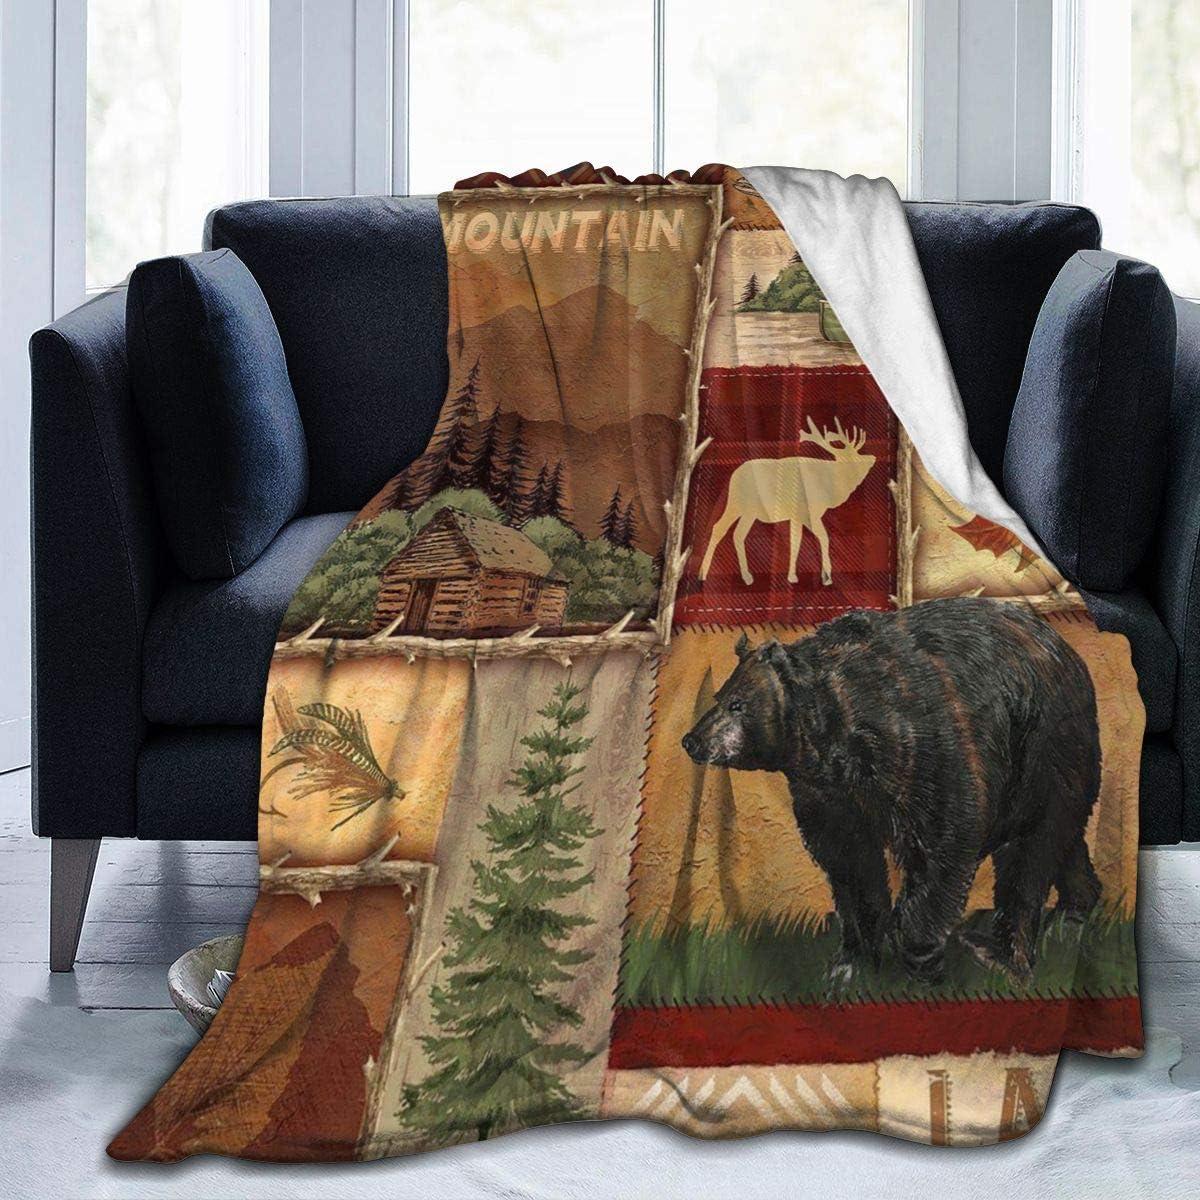 Cyloten Blanket Rustic Lodge Bear Moose Deer Fleece Blanket Foldrable Throw Blanket Washable Couch Sofa Fuzzy Blanket Reversible Plush Blanket Beach Blanket for Home Office